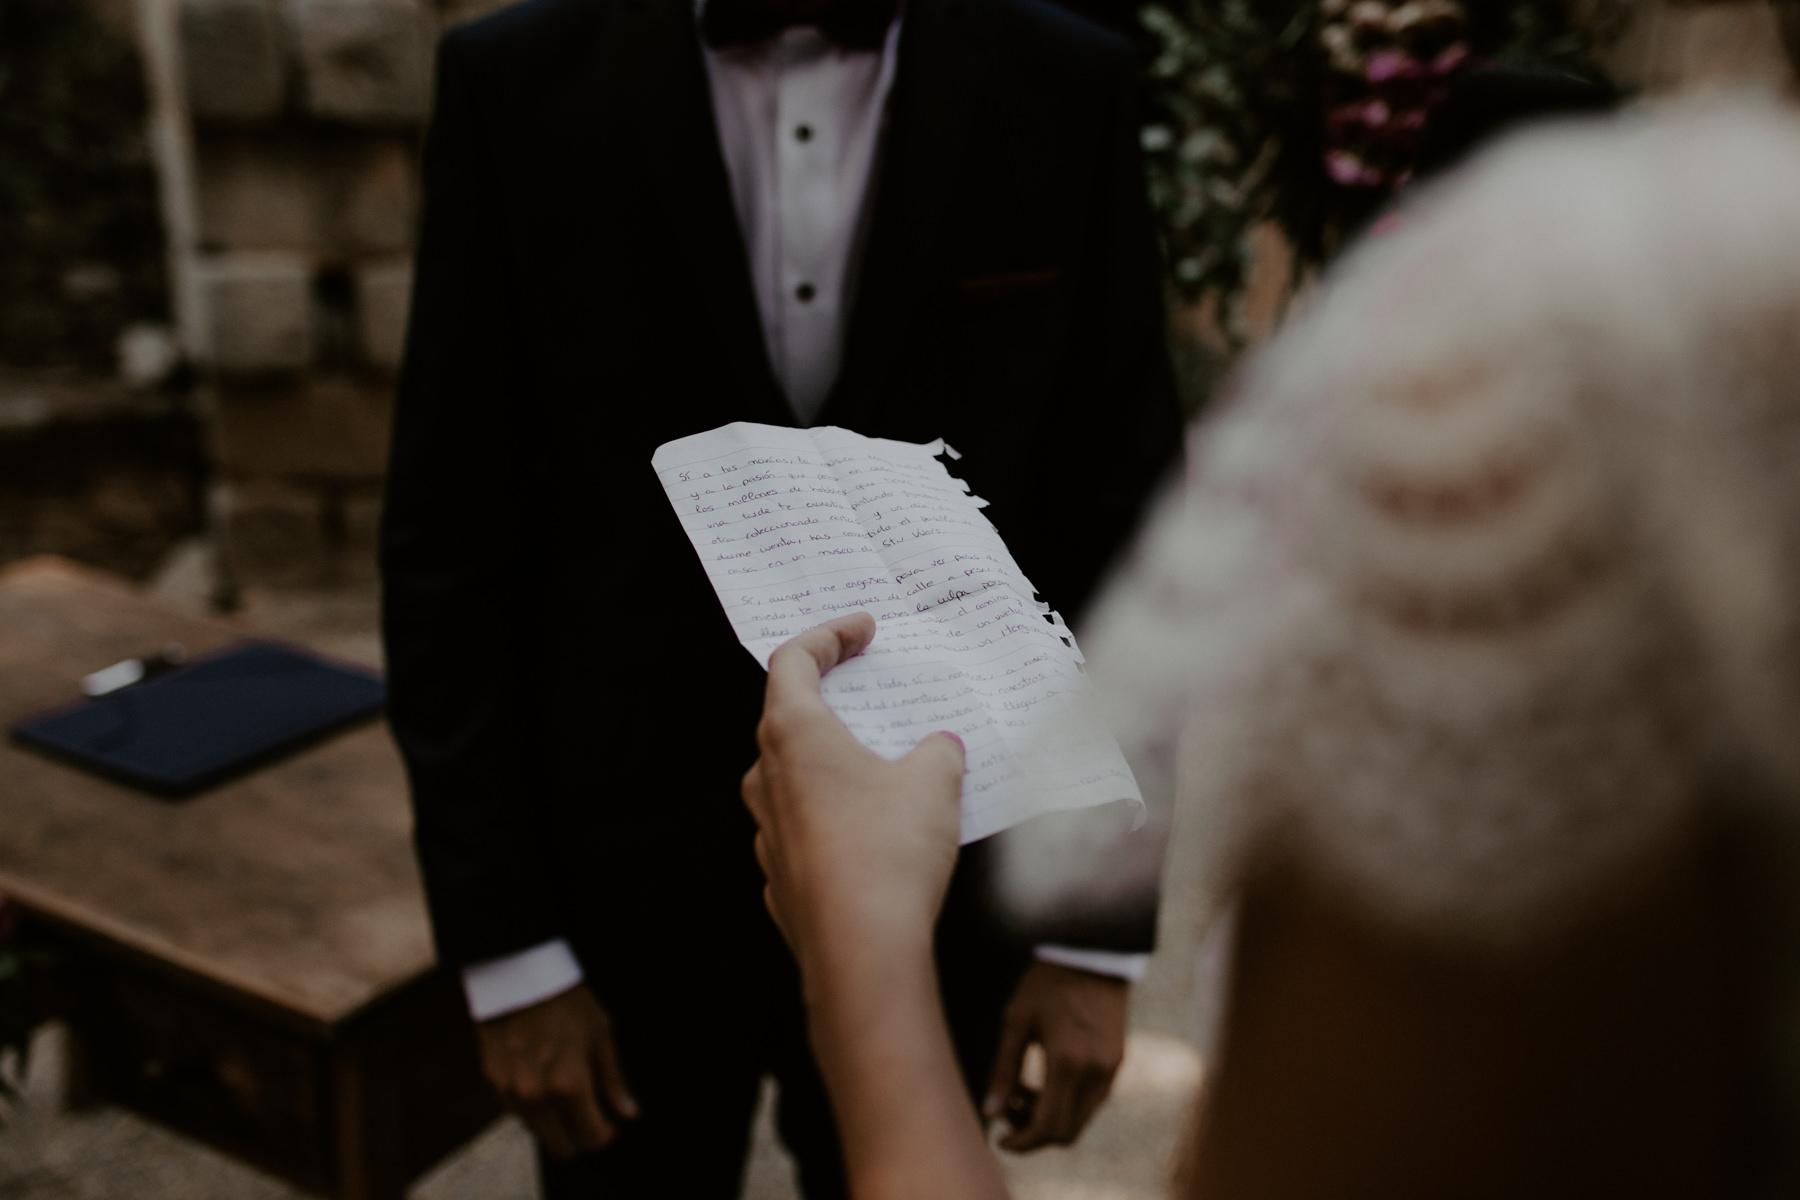 alt_thenortherngirlphotography_couples_weddingphotographer_photographer_wedding_boda_fotografodebodas_fotografobodasbarcelona_bodaindie_bodasconestilo_bodaensantperedeclara_jennifermiguel-339.jpg